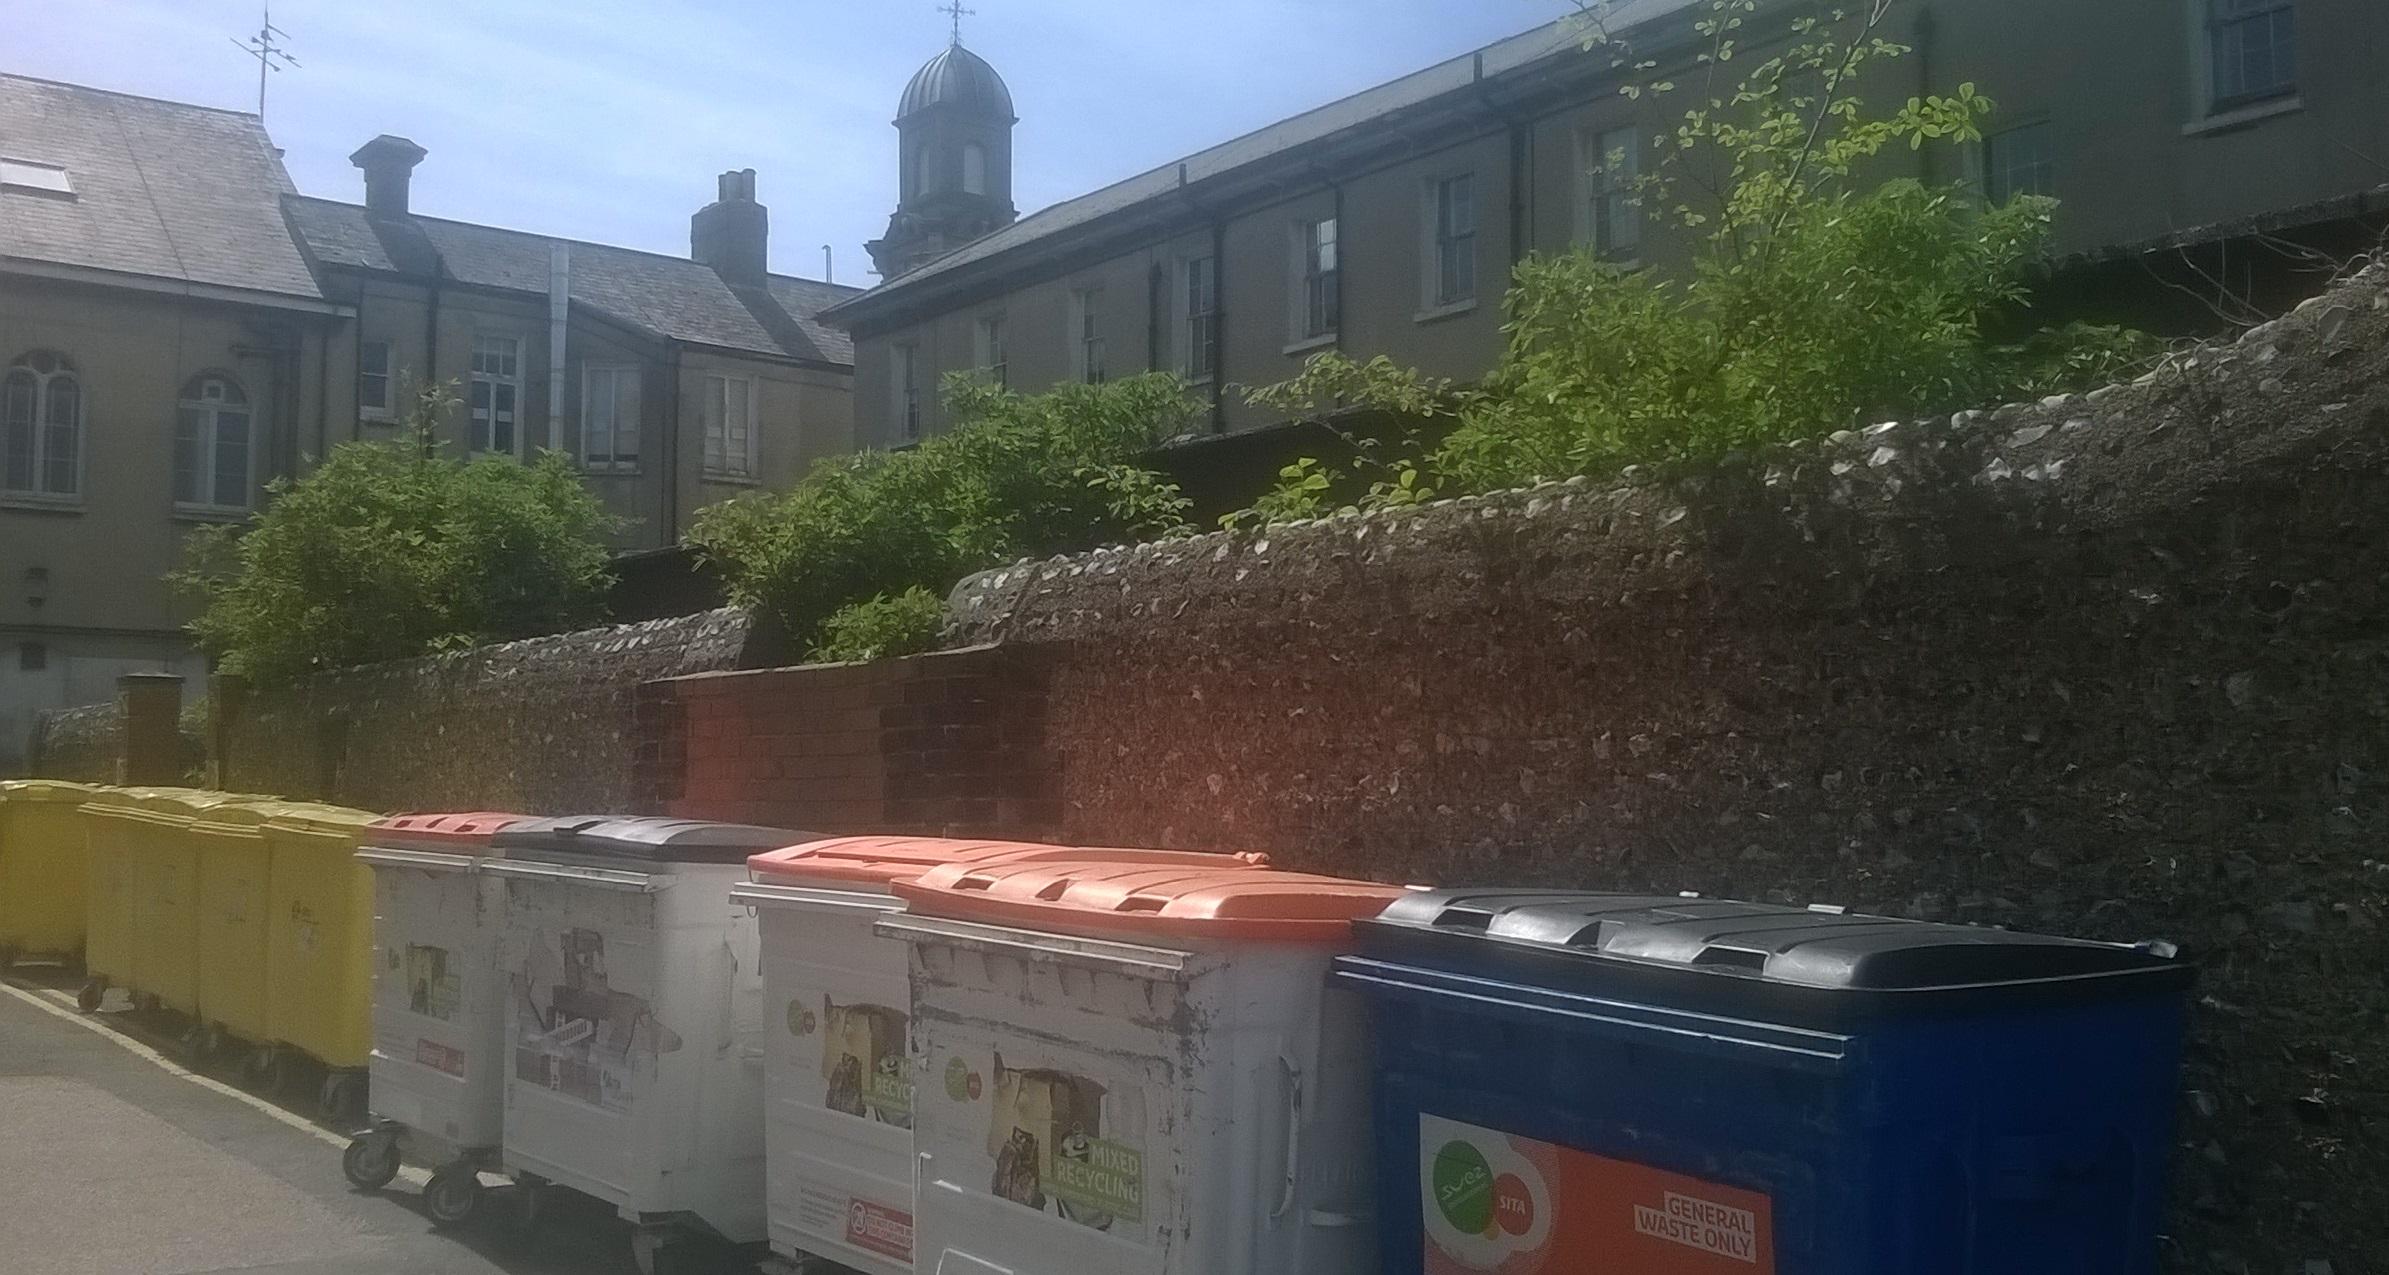 waste removal Sussex Community Trust external waste bins